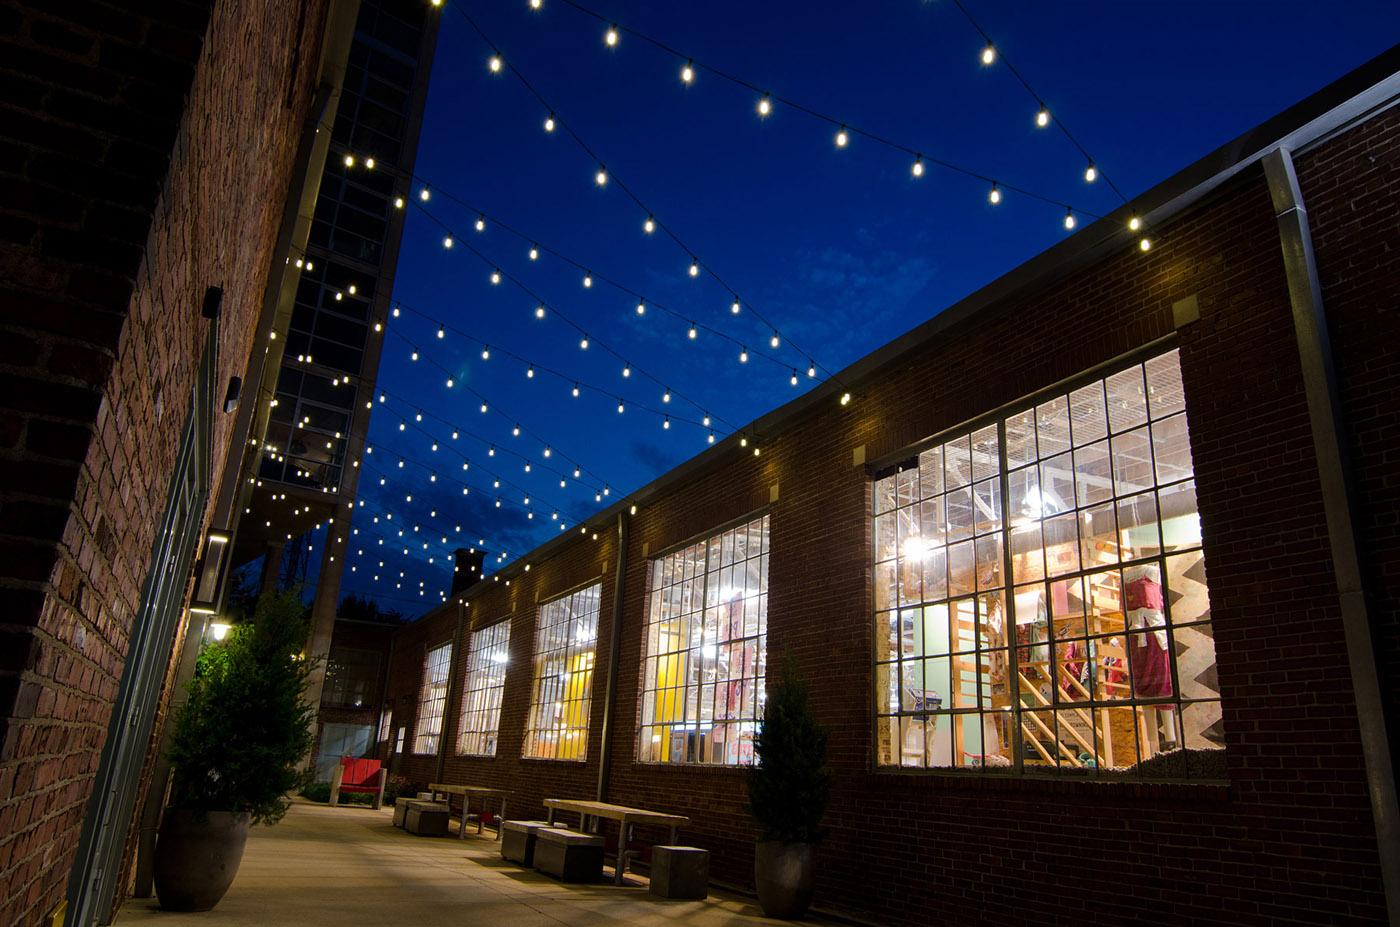 outdoor lighting effects. Outdoor Lighting Effects